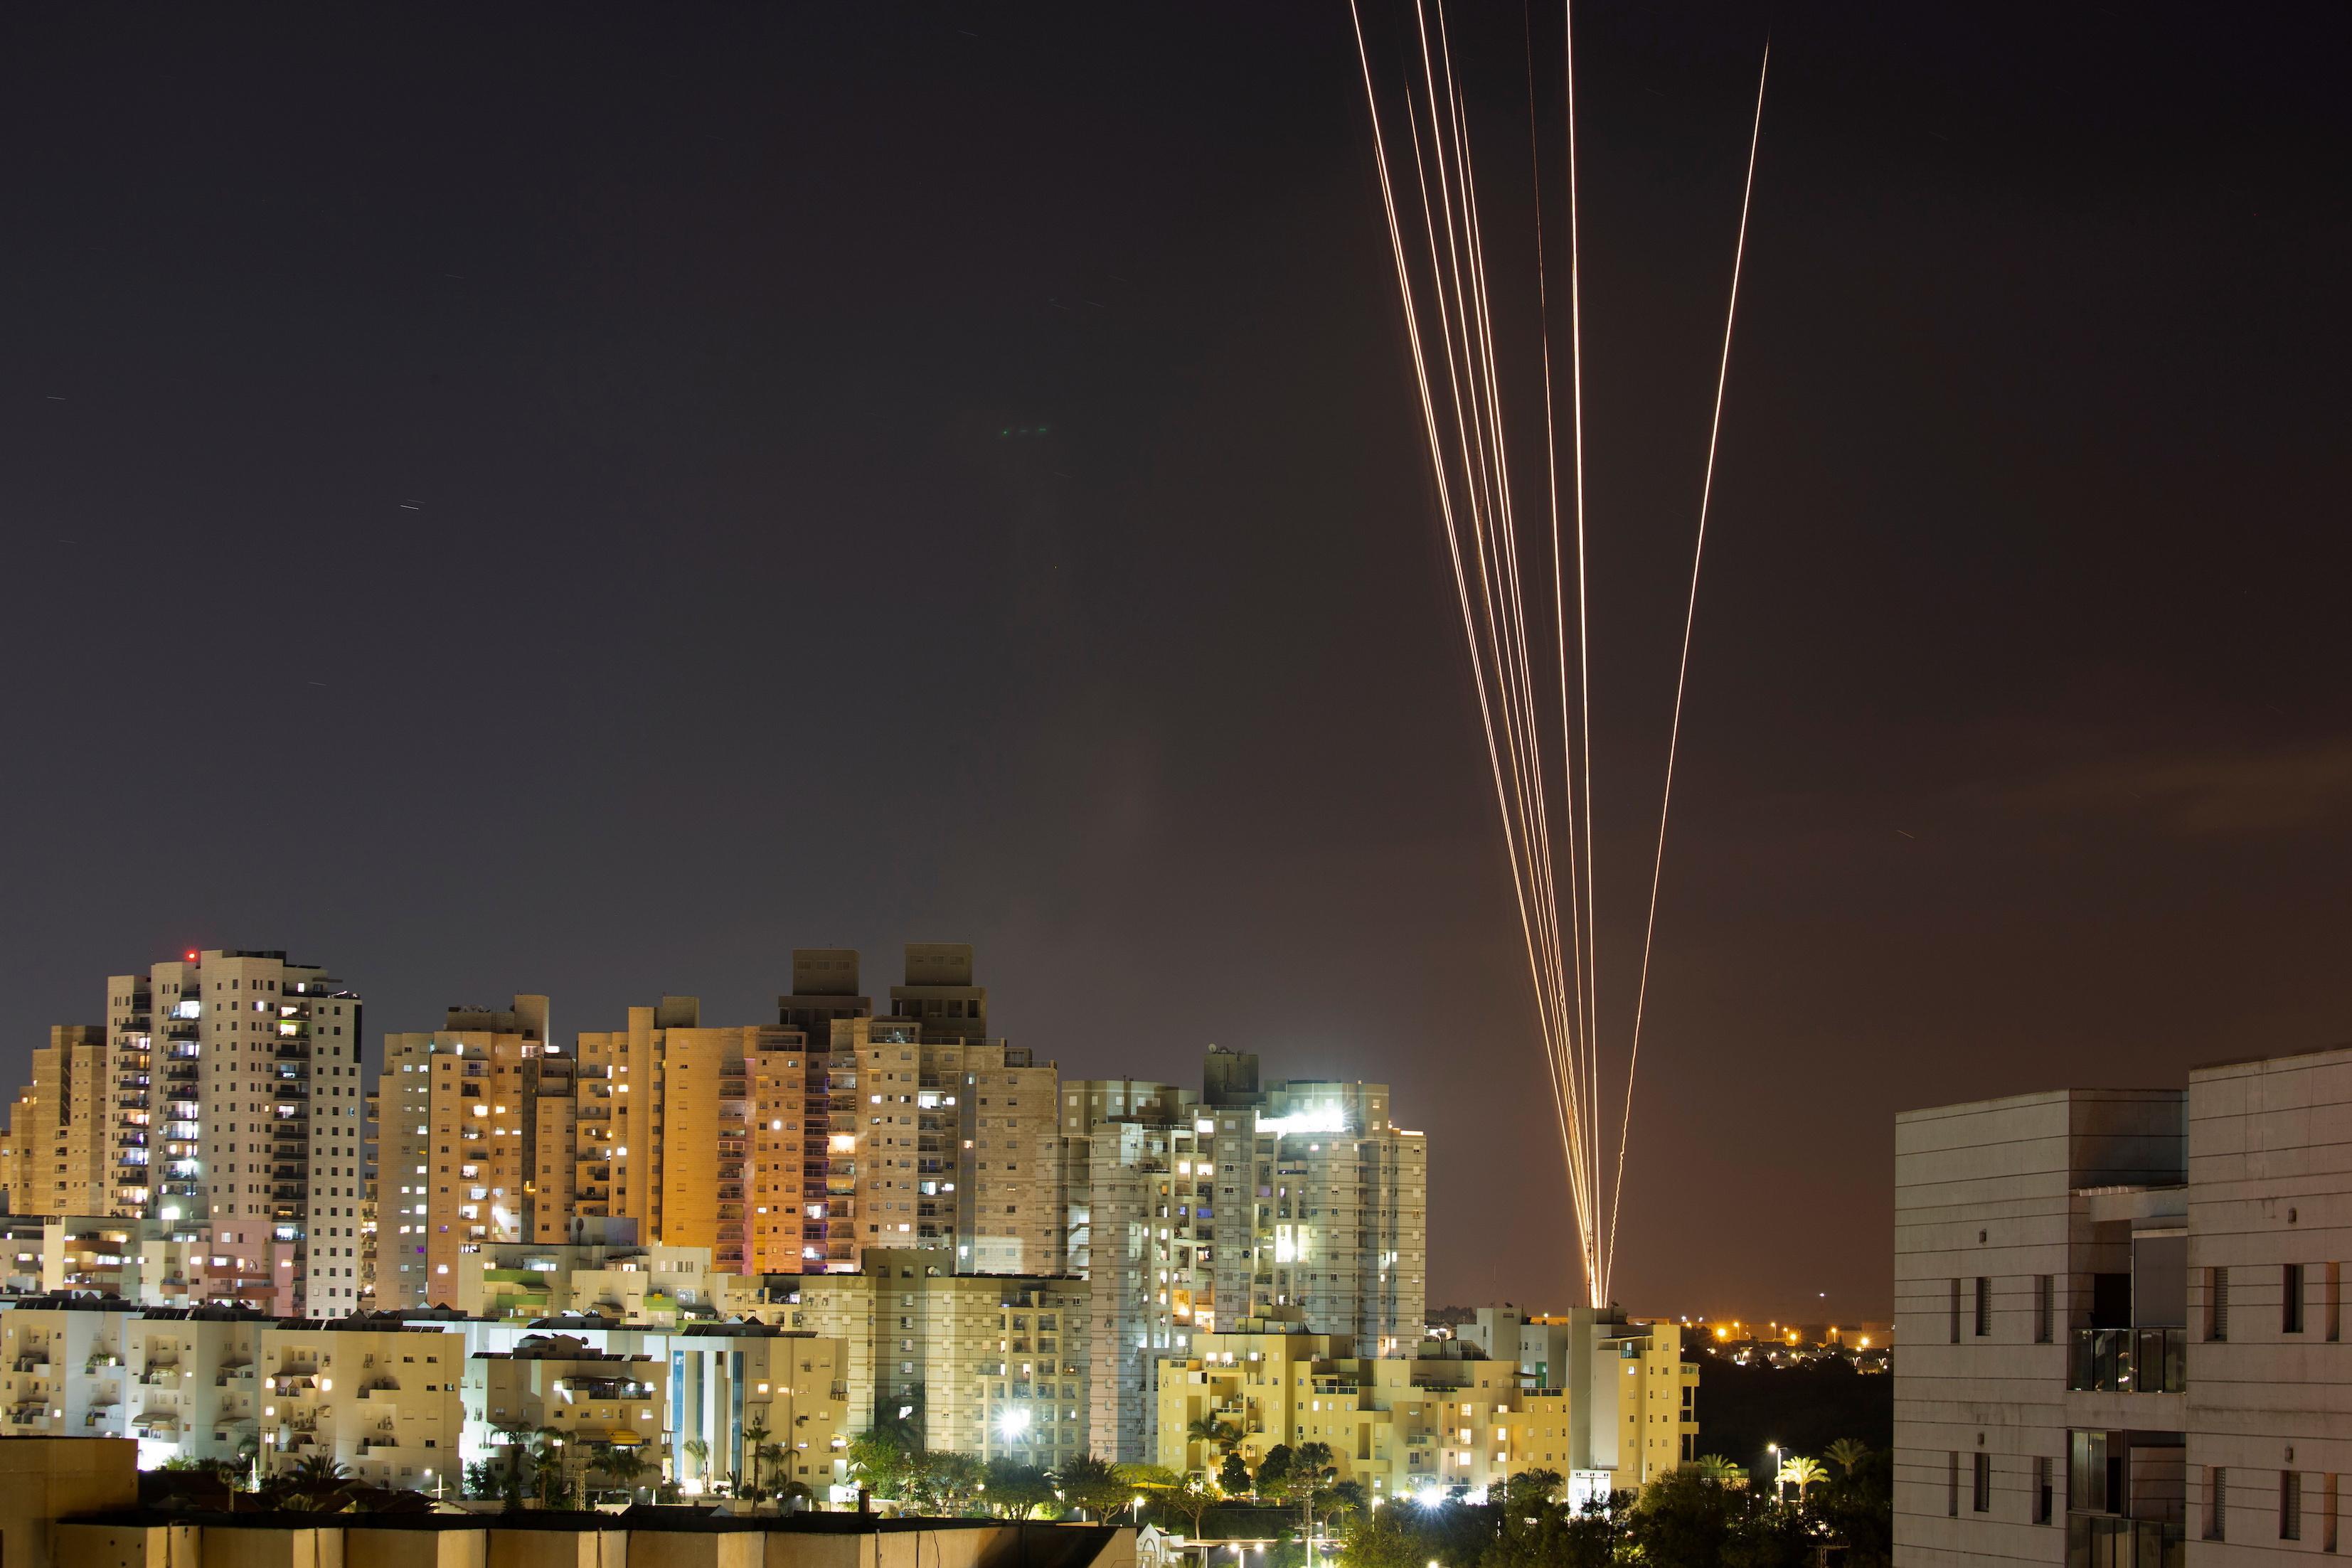 No Pinoys hurt amid Israel-Gaza conflict —Bello